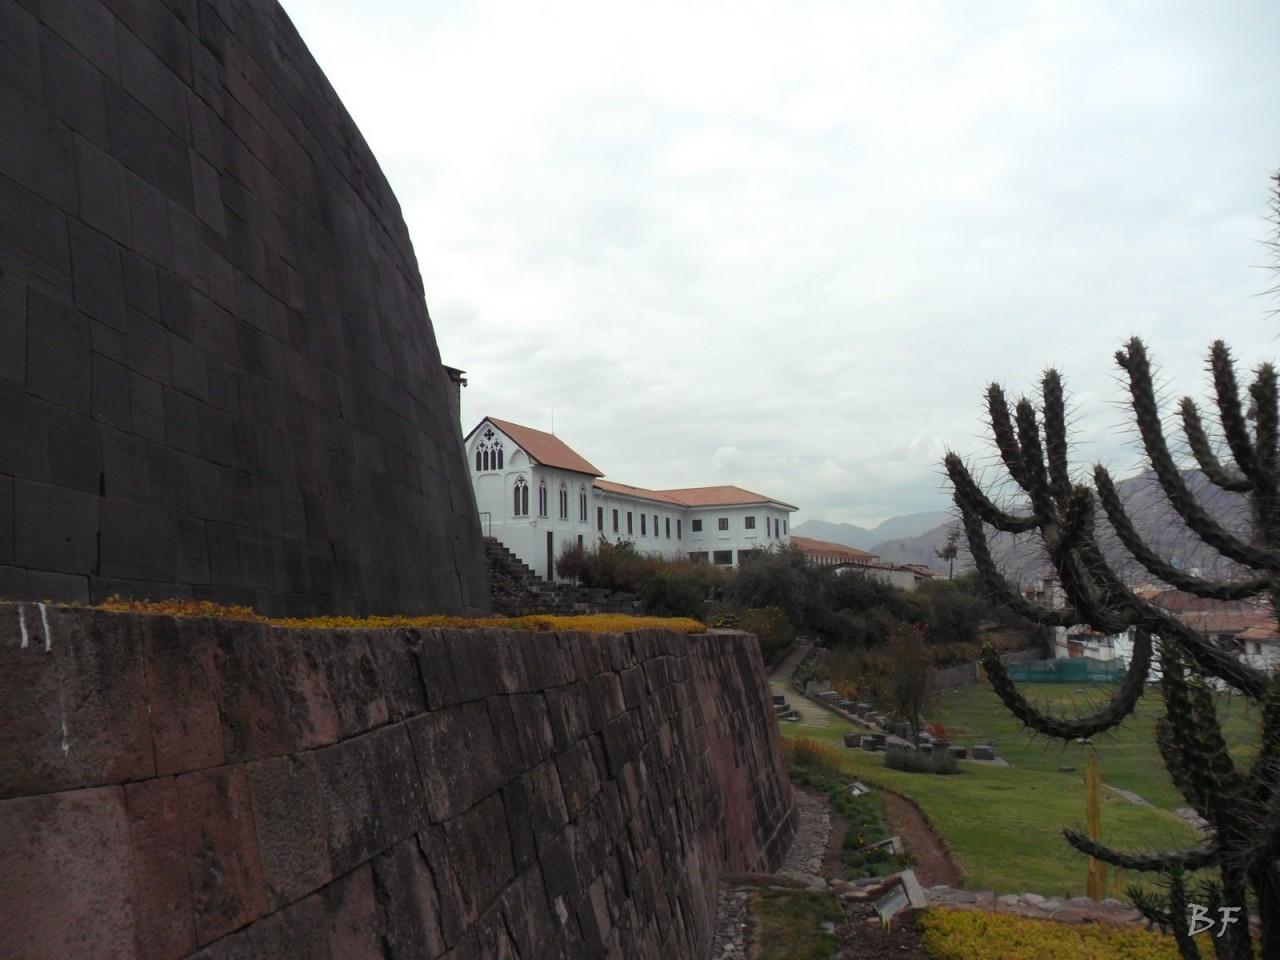 Mura-Poligonali-Megaliti-Tempio-Coricancha-Cusco-Perù-9